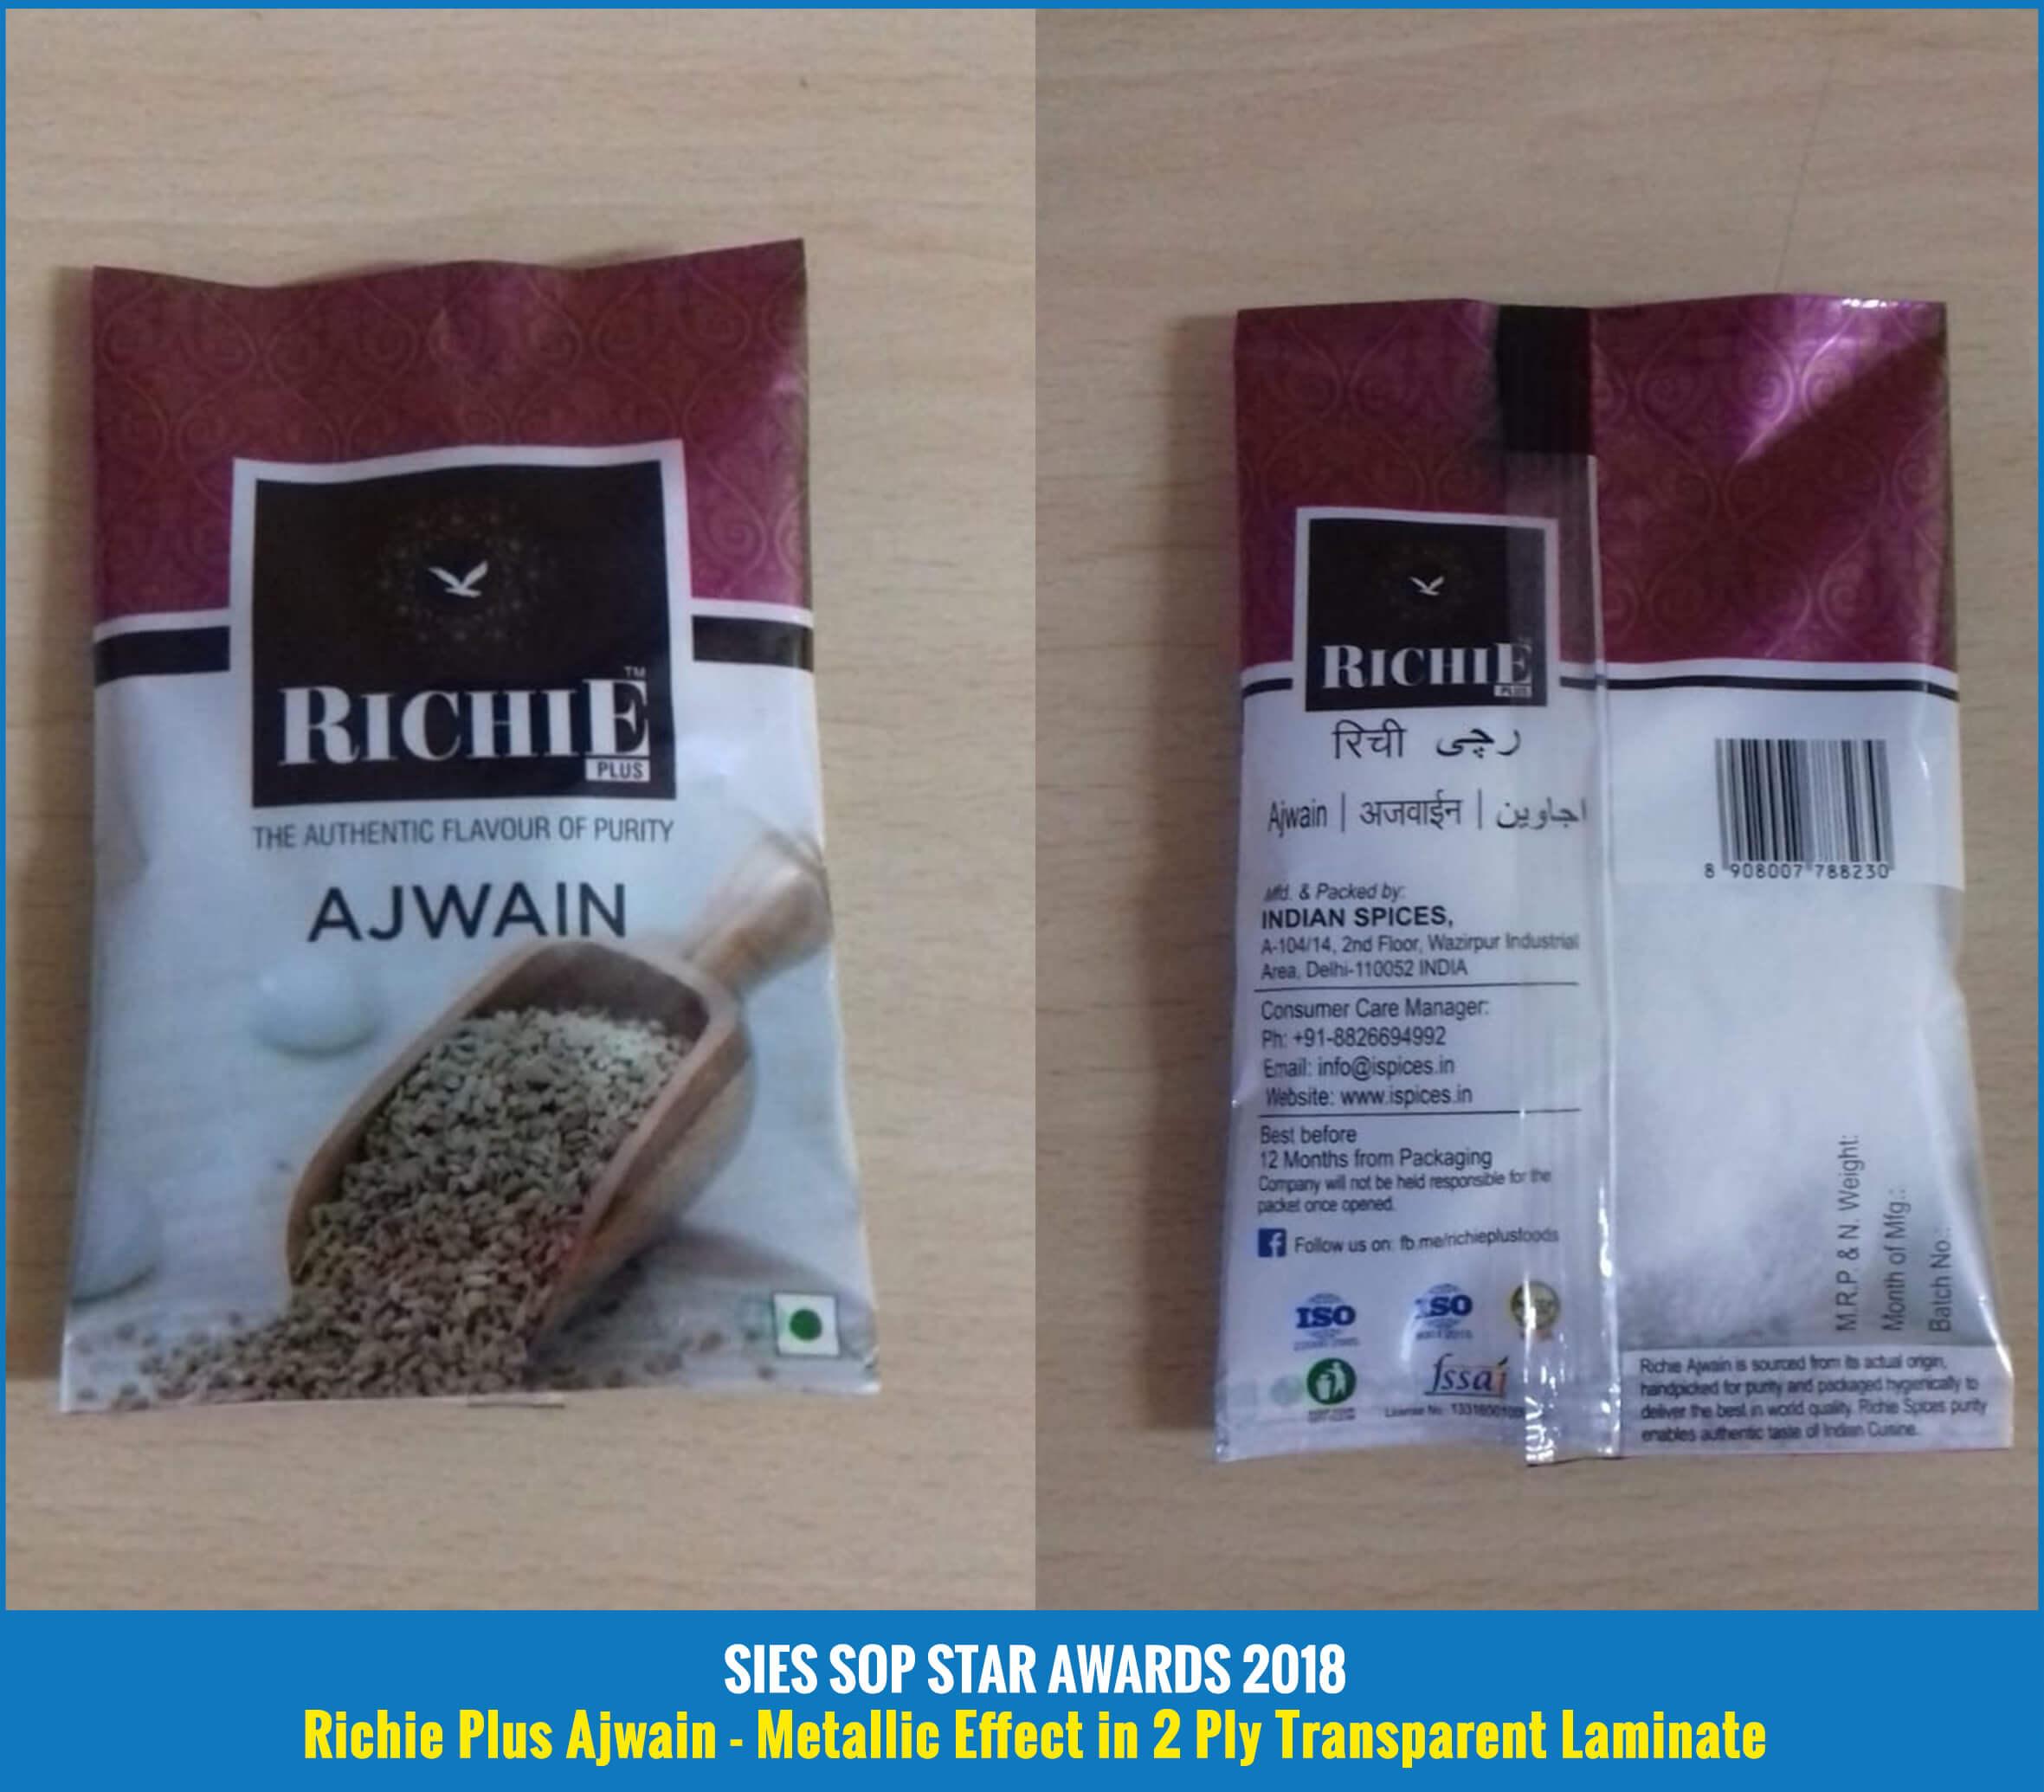 Richie Plus Ajwain - Metallic Effect in 2 Ply Transparent Laminate